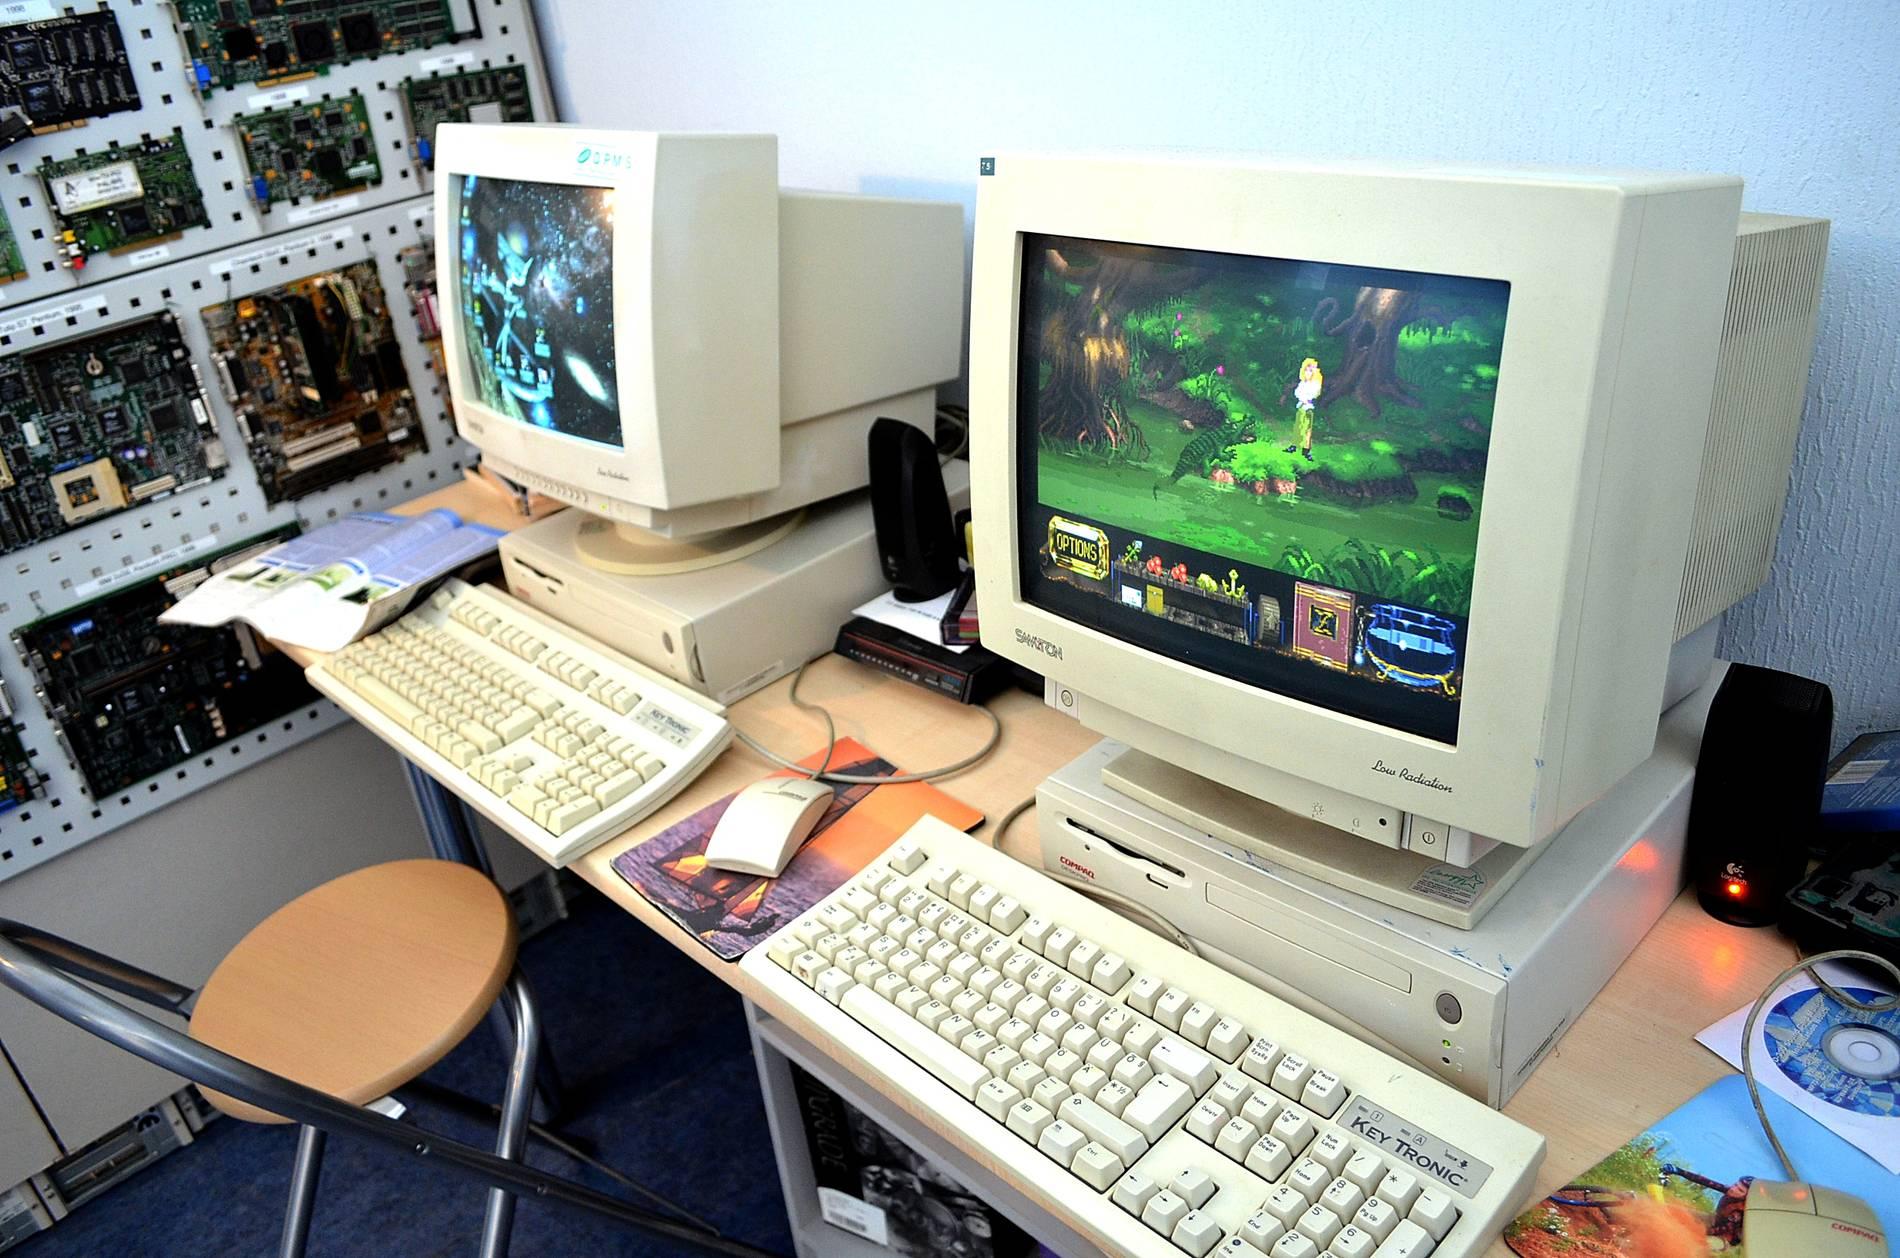 Computer Museum in Tallinn, Estonia